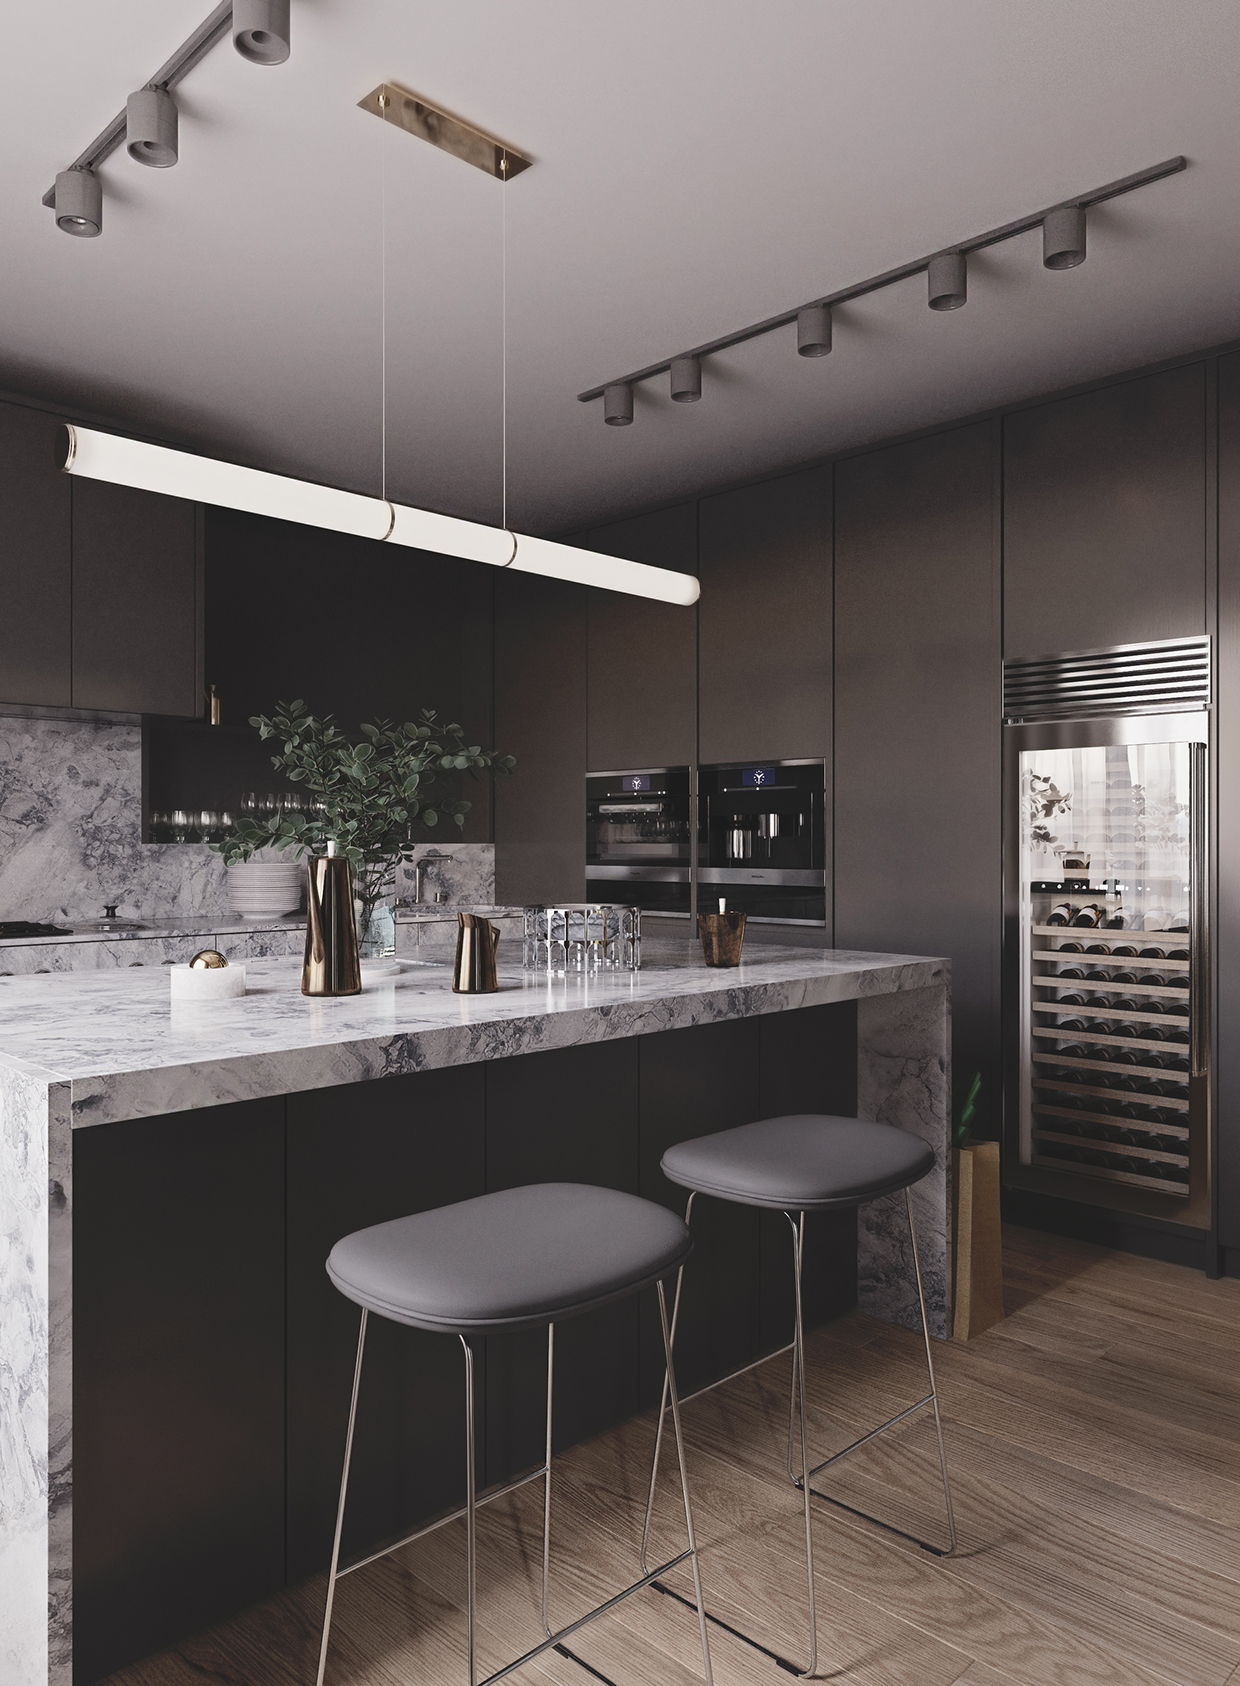 Master bedroom kitchenette  Alexandra Camarinha alexa on Pinterest